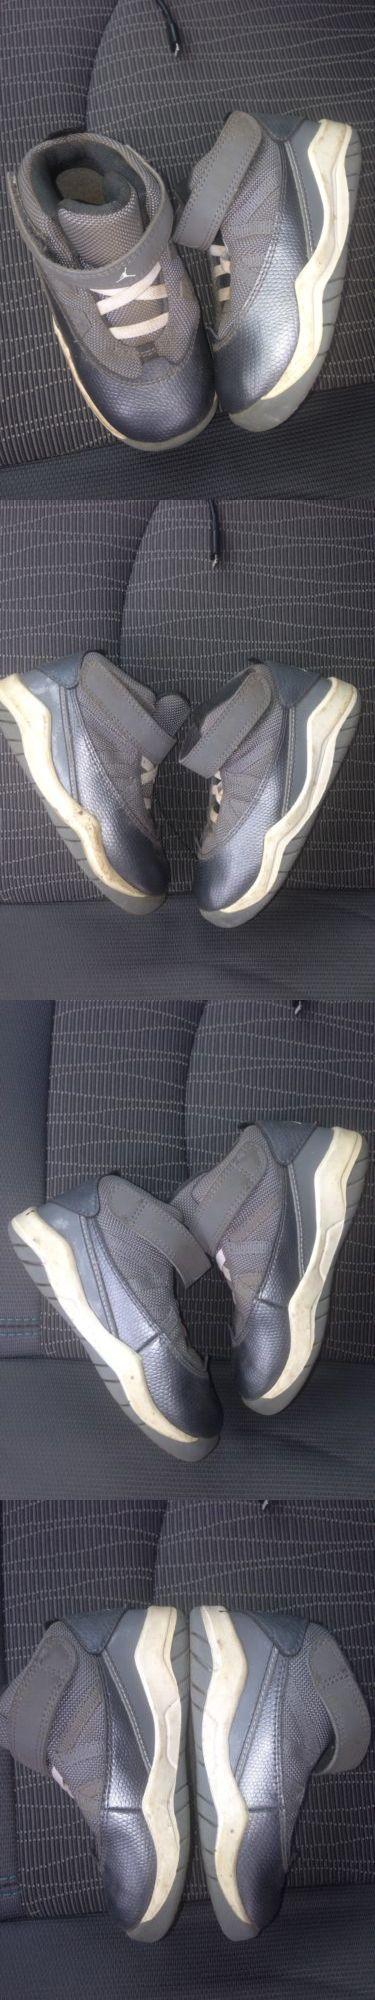 Michael Jordan Baby Clothing: Nike Air Michael Jordan Xi Size 7C Baby Shoes Gray White Childrens Cool Grey -> BUY IT NOW ONLY: $3.99 on eBay!